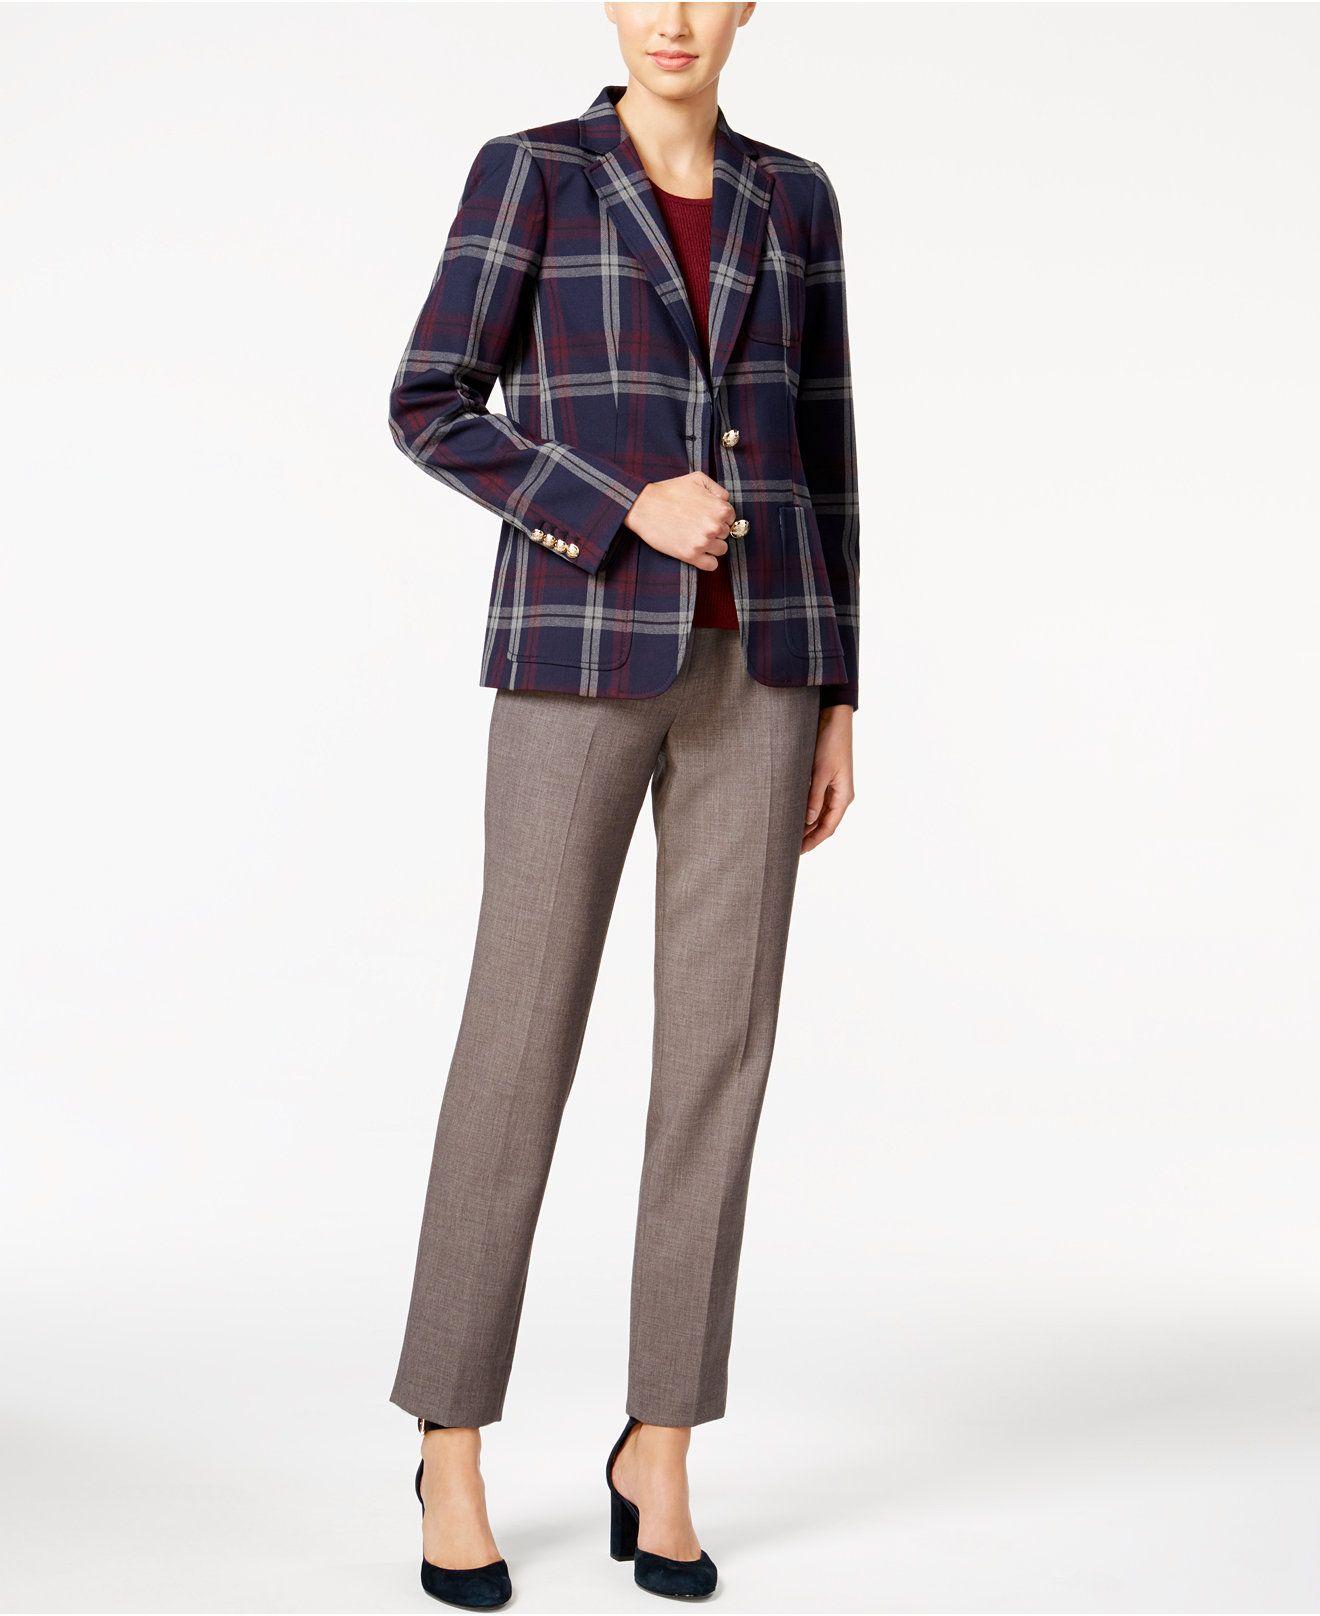 TOMMY HILFIGER Womens Navy Plaid Wear To Work Jacket Size: 4